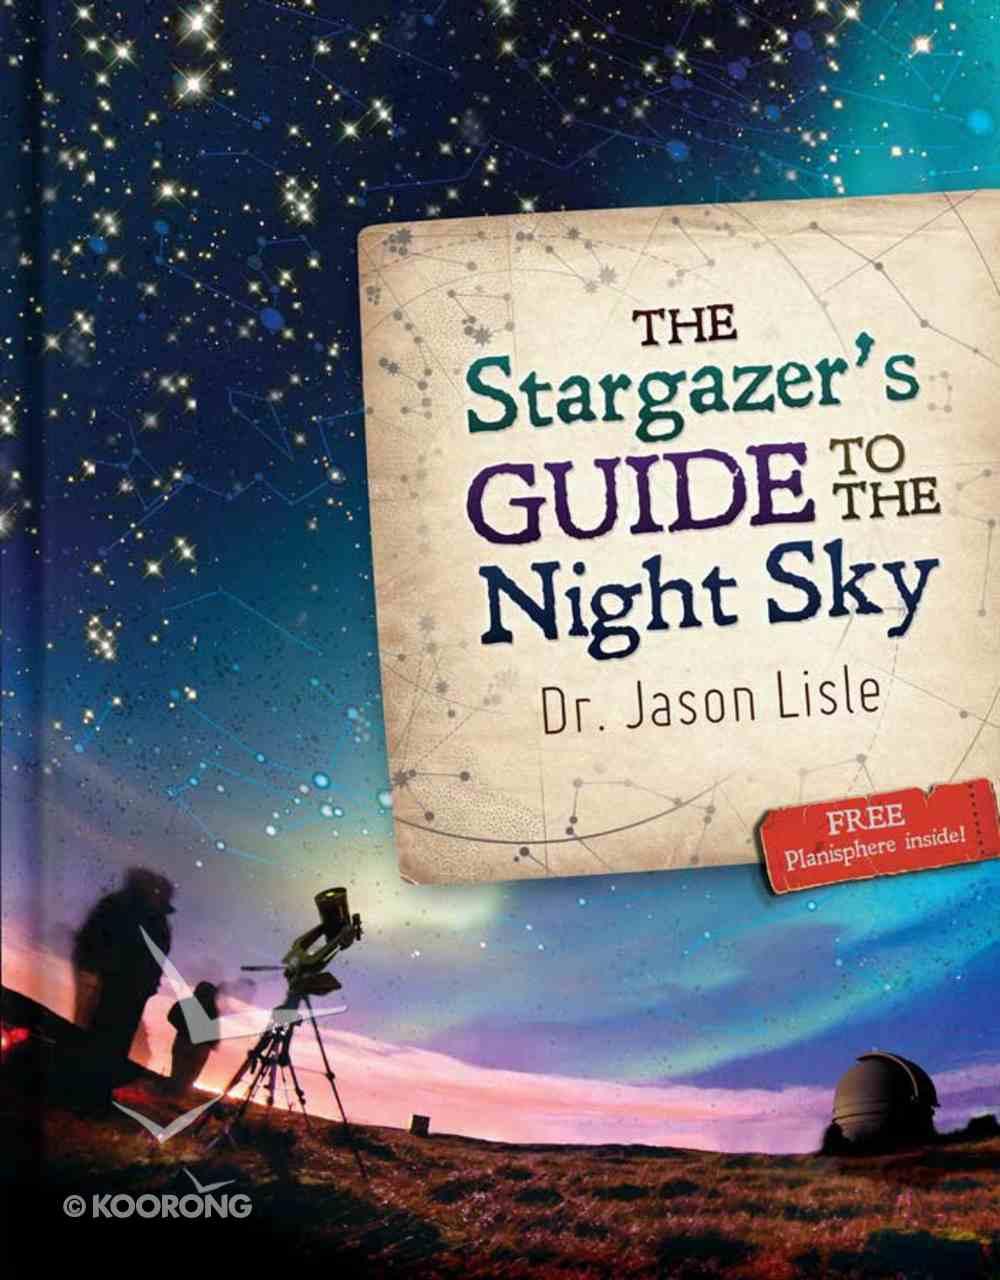 The Stargazer's Guide to the Night Sky (Includes Free Planishpere) Hardback